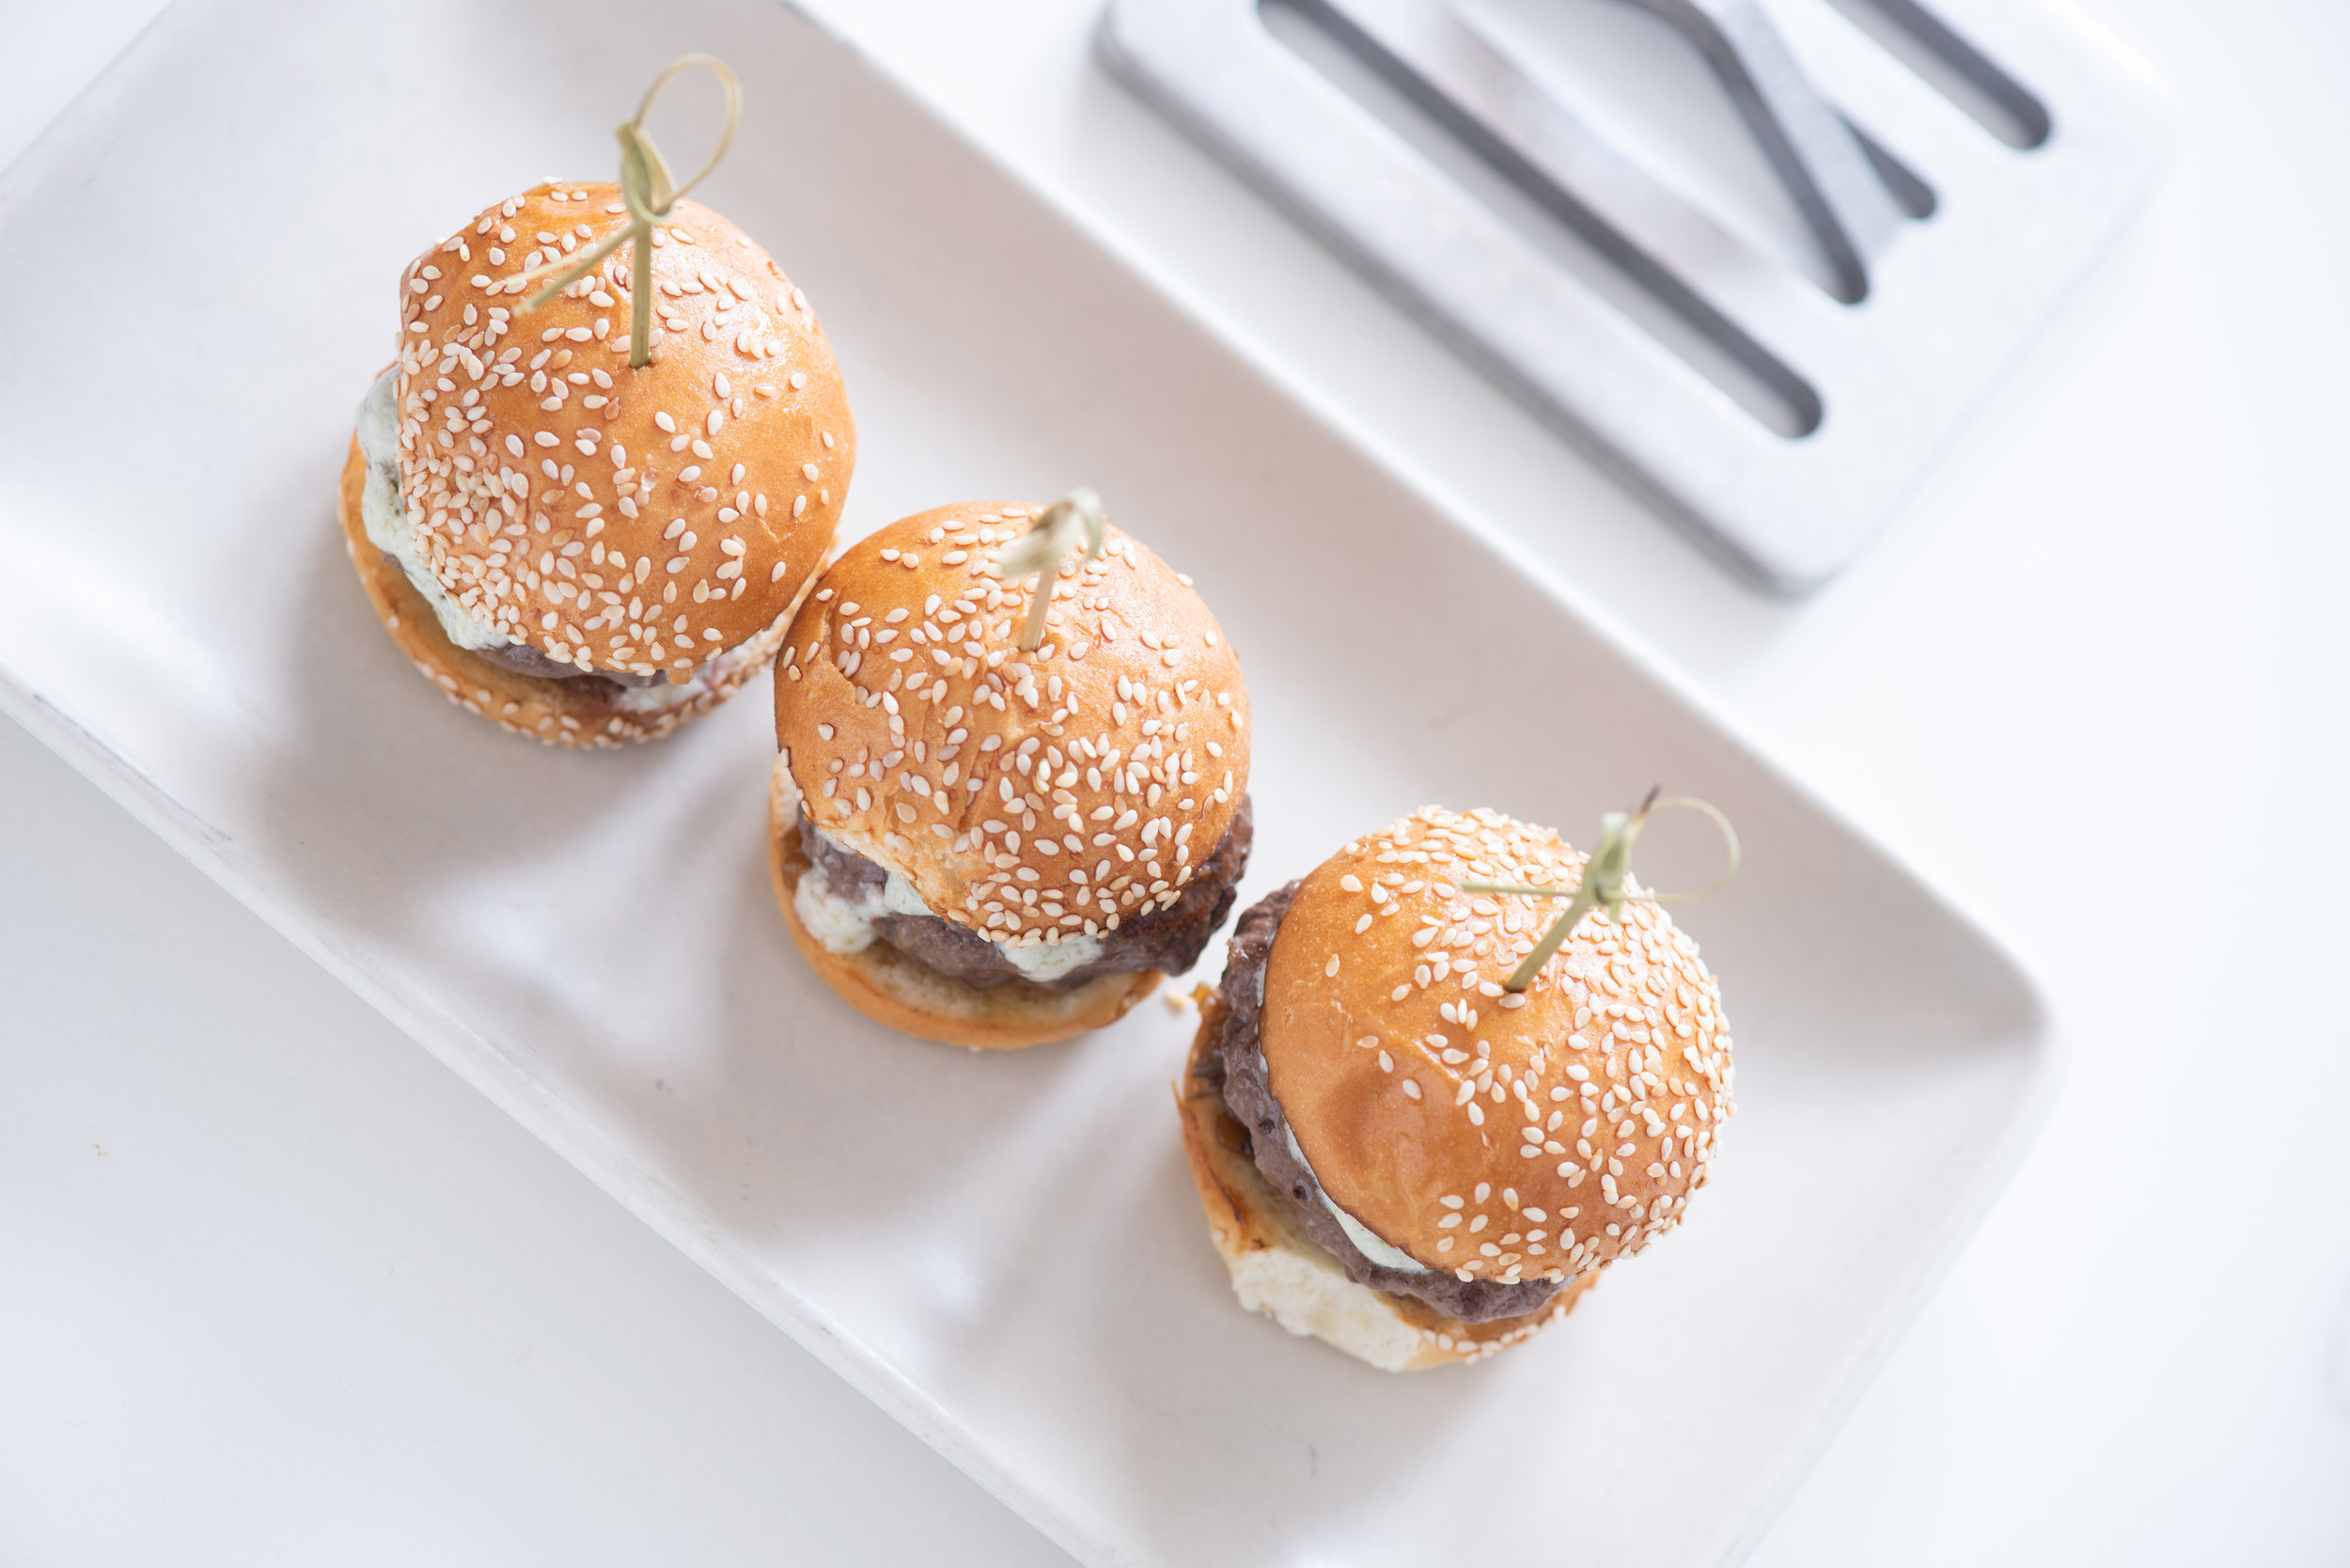 Picco Mini Burgers